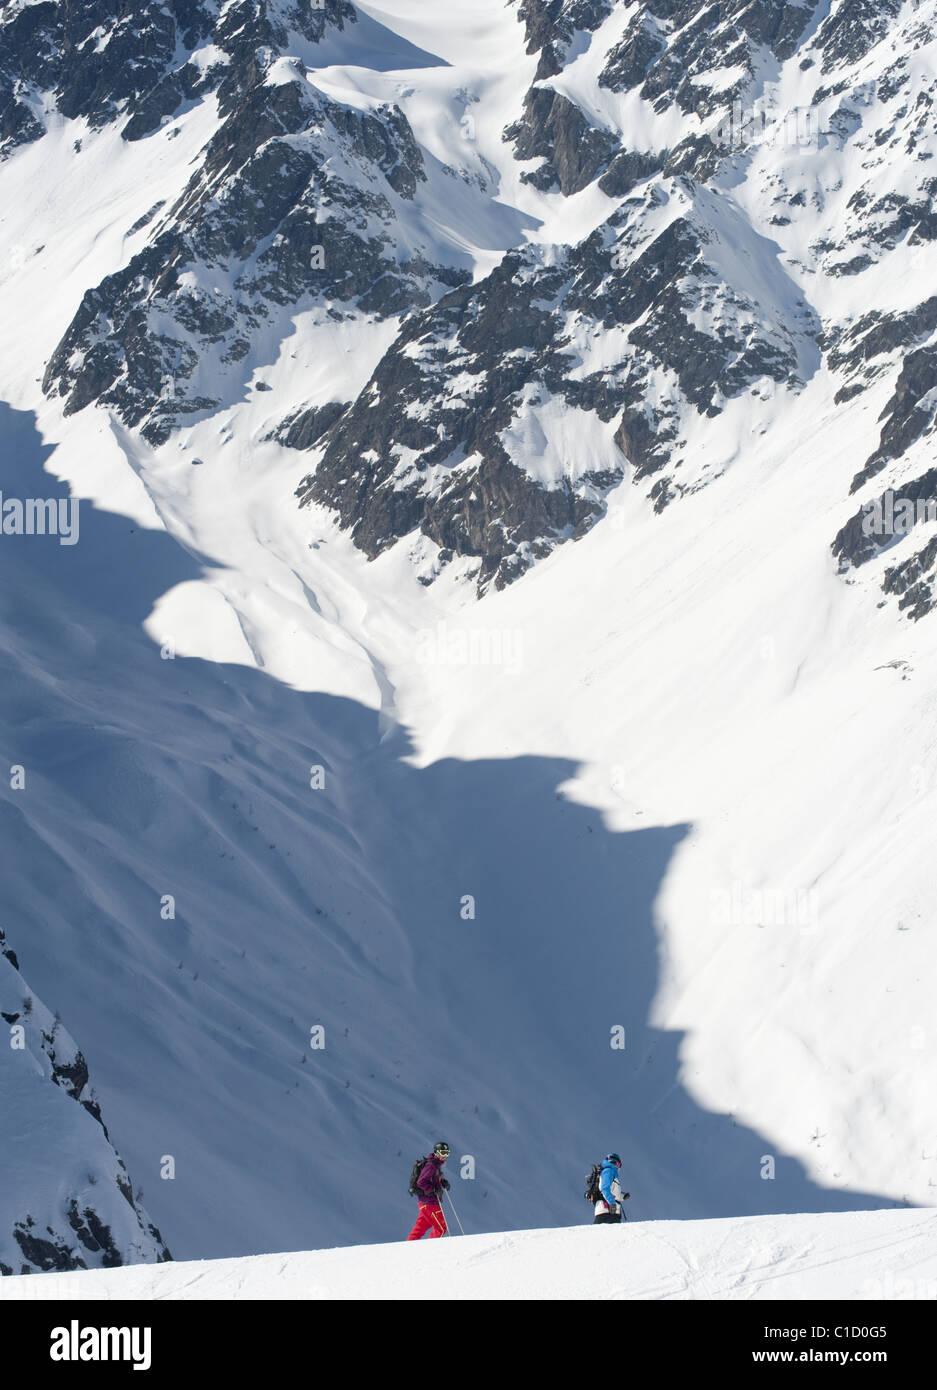 free riding snowboarding stock photos free riding snowboarding